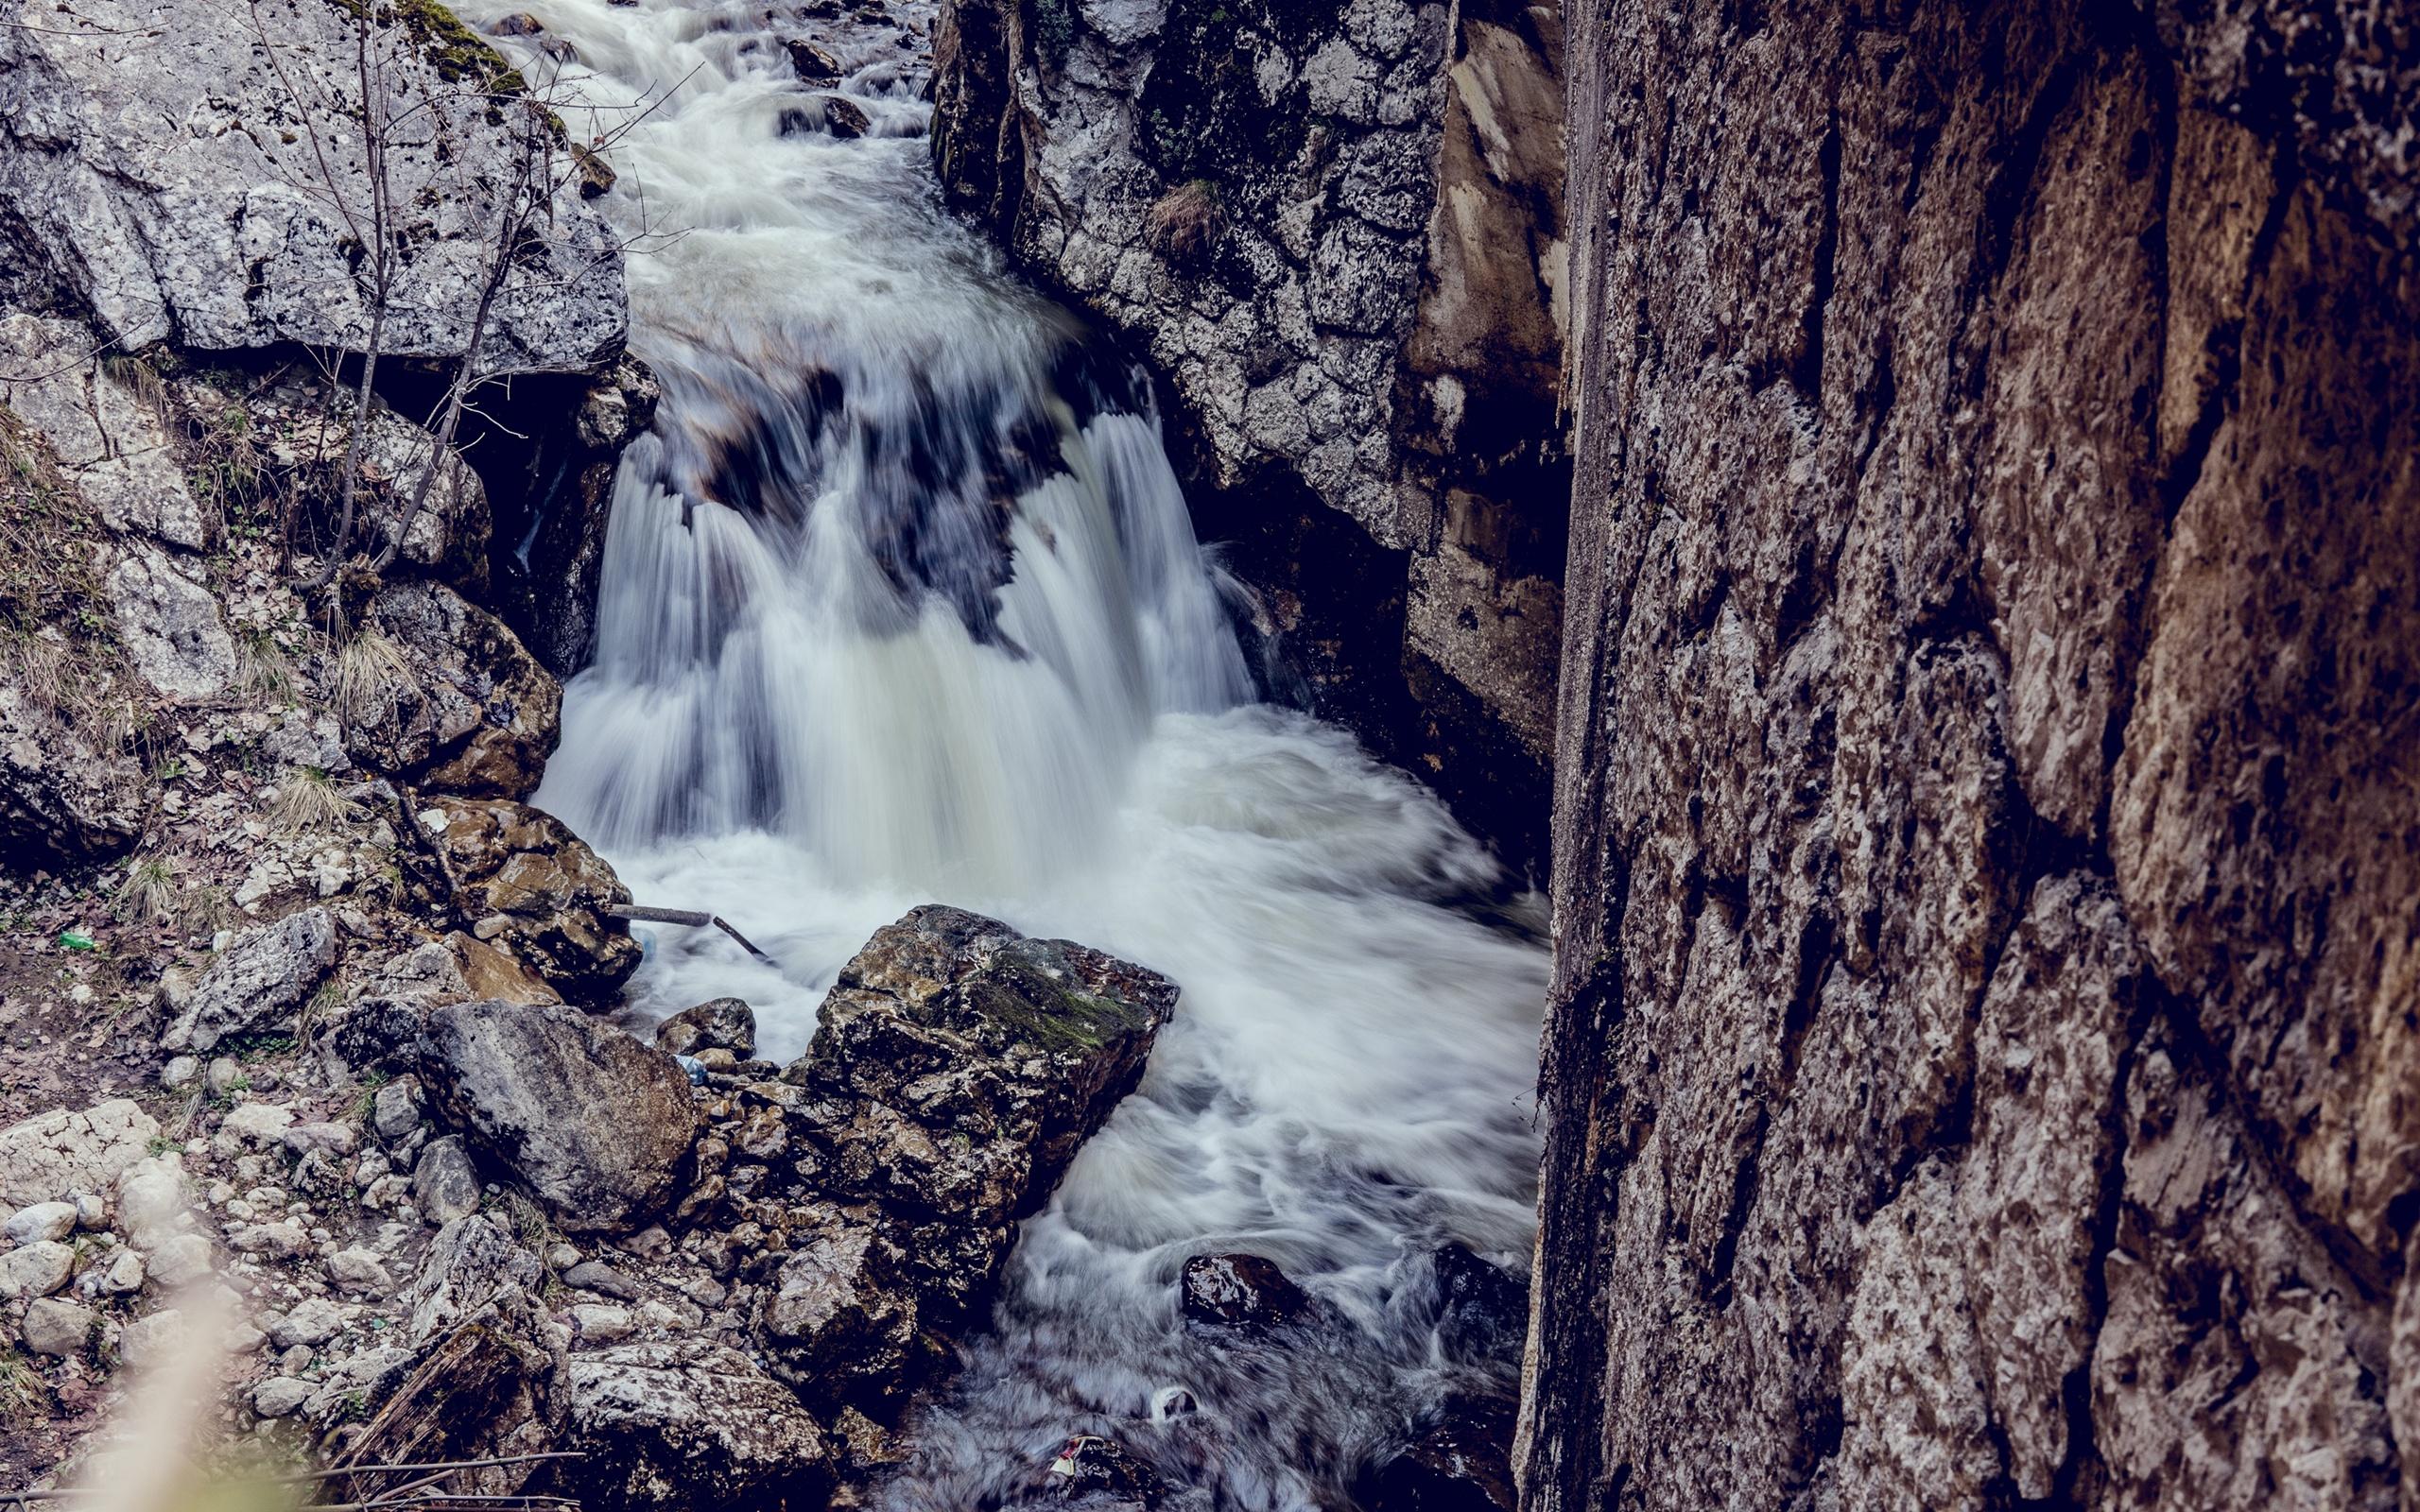 Stream rocks nature wallpaper 2560x1600 resolution - Nature wallpaper 2560x1600 ...